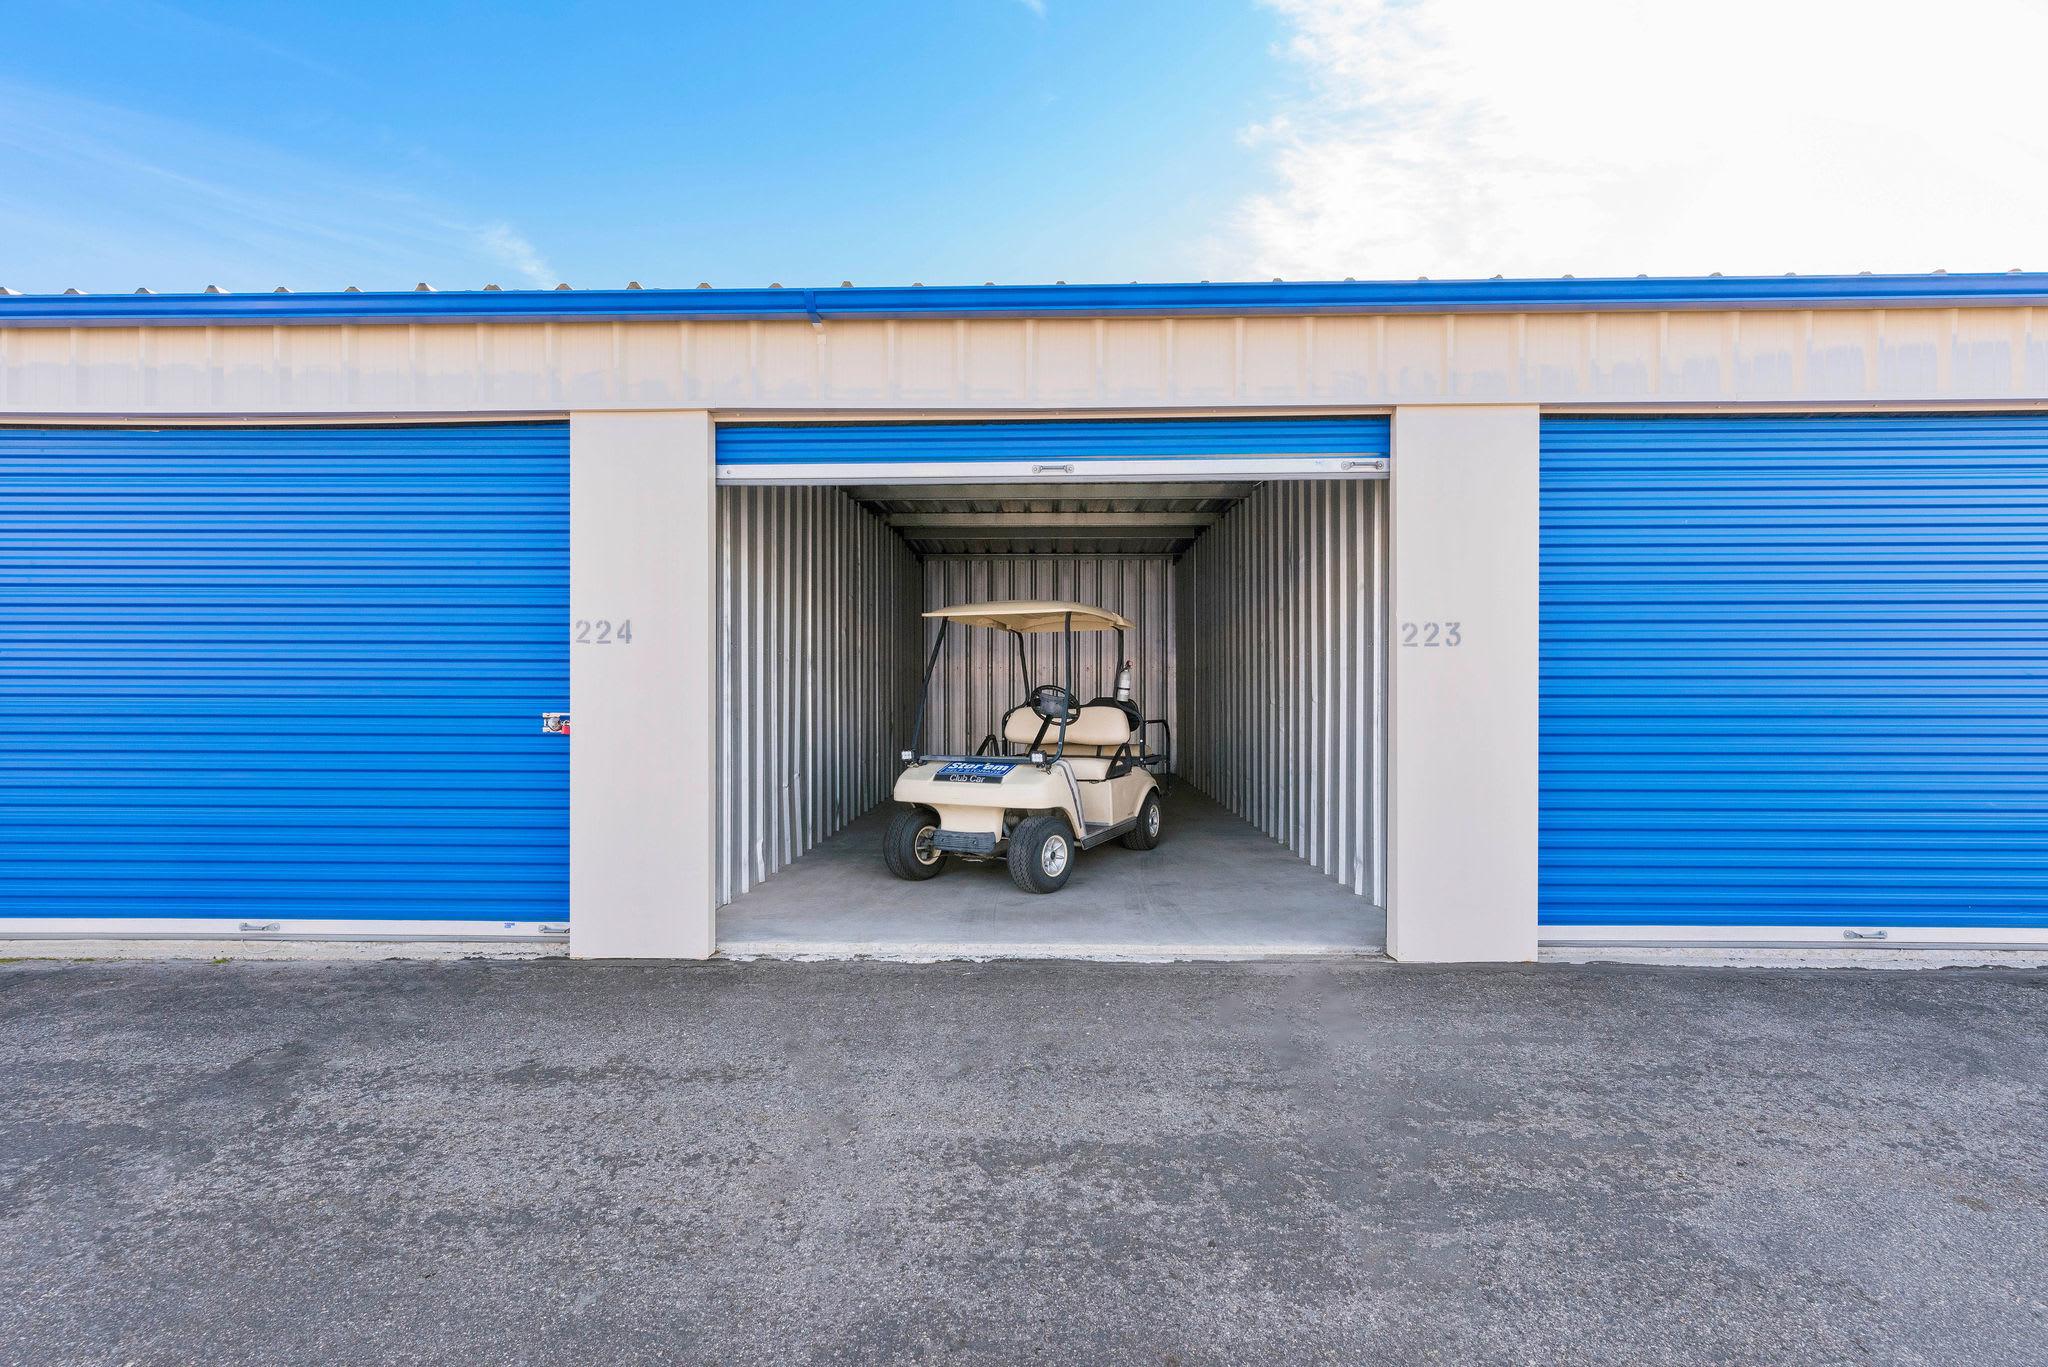 Drive up storage open with golf cart at Stor'em Self Storage in Orem, Utah